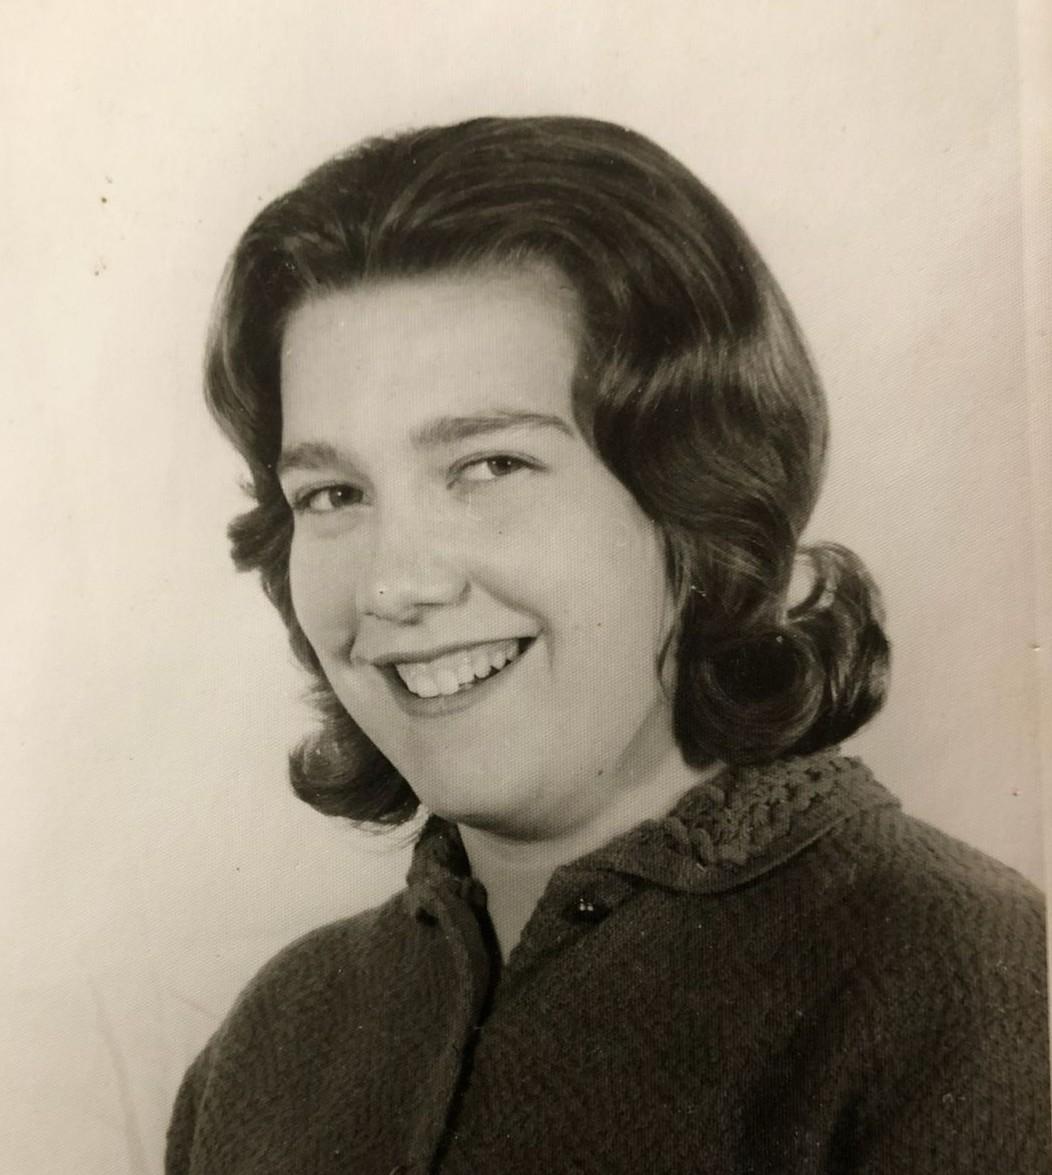 Carole A. Fife